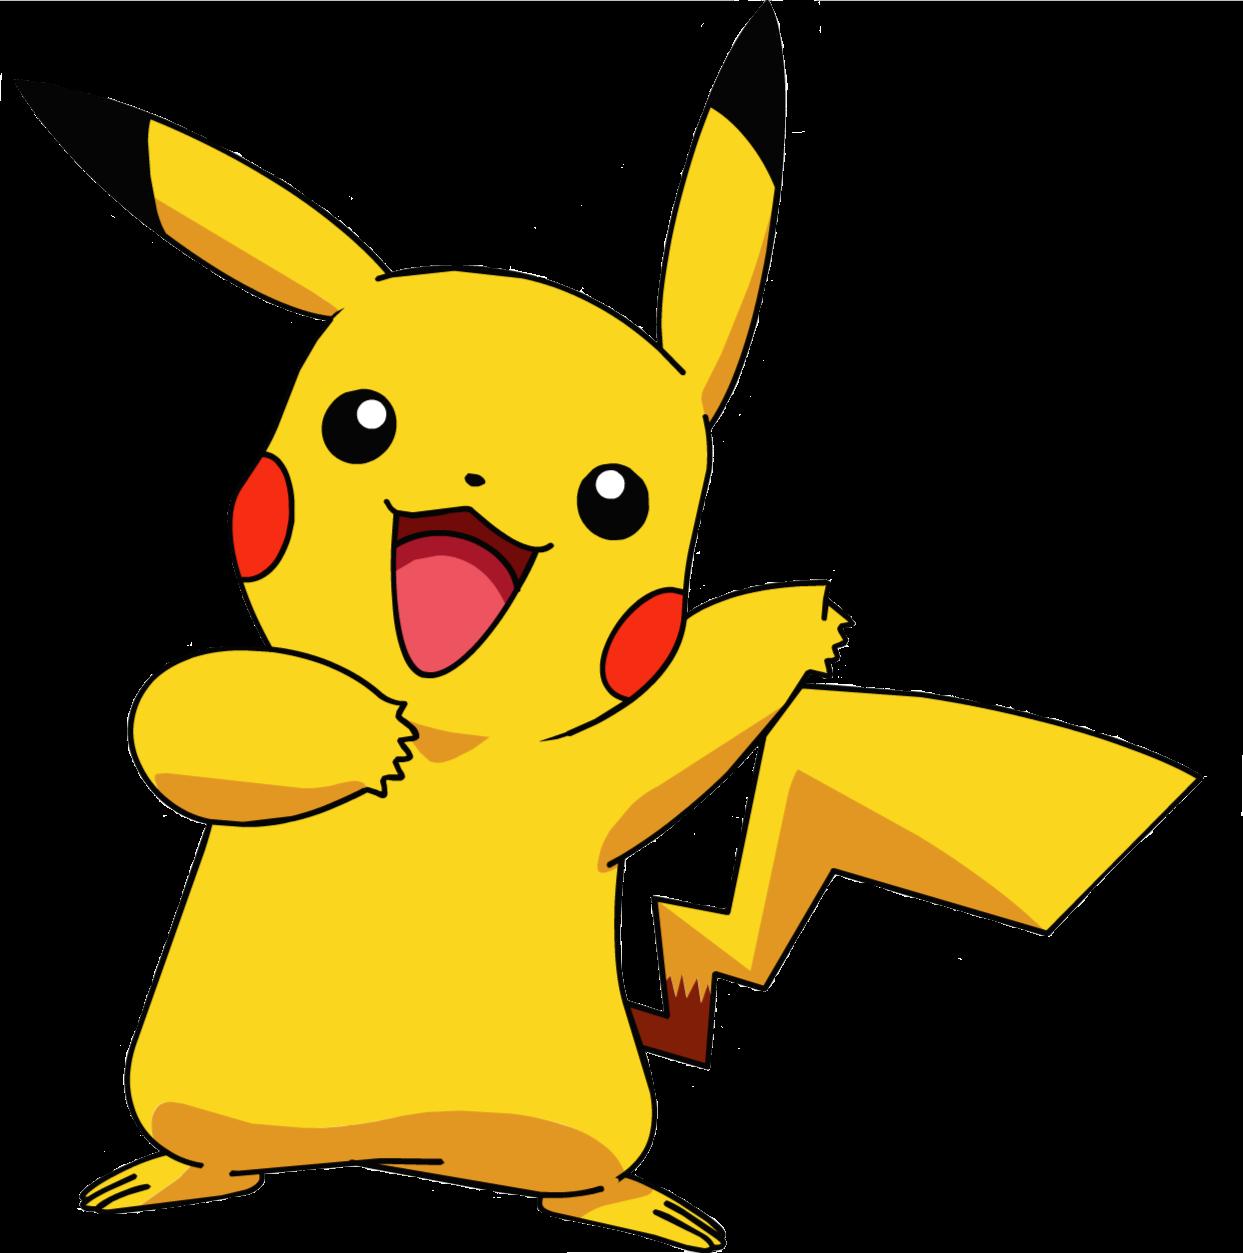 Pikachu clipart transparent Transparent Pikachu Transparent Free and